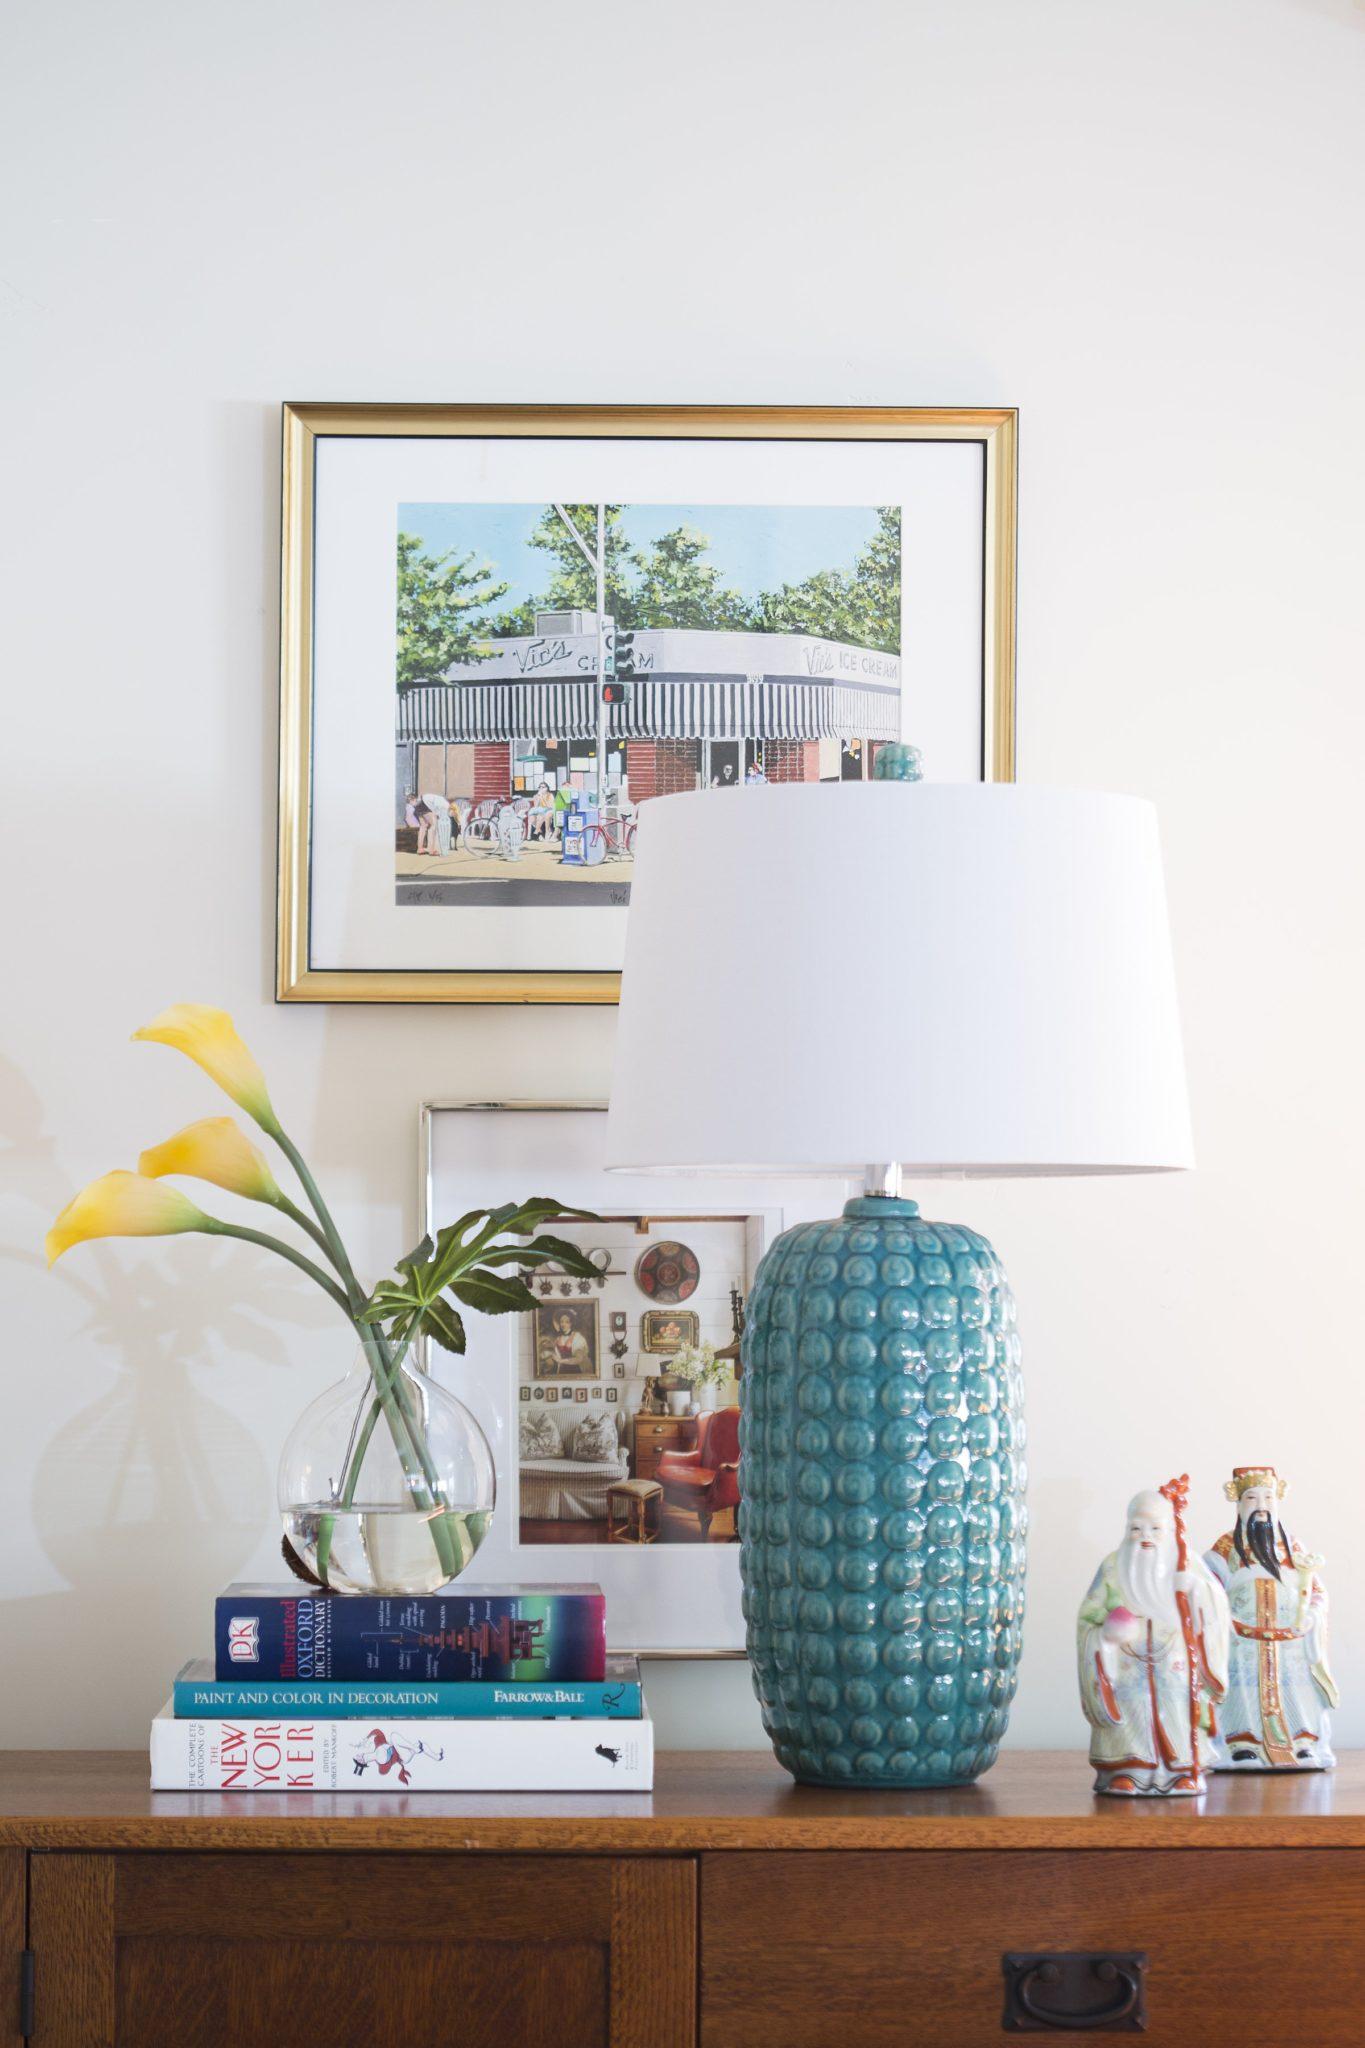 Eclectic family room vingette in Land Park, Sacramento, by PepperJack Interiors